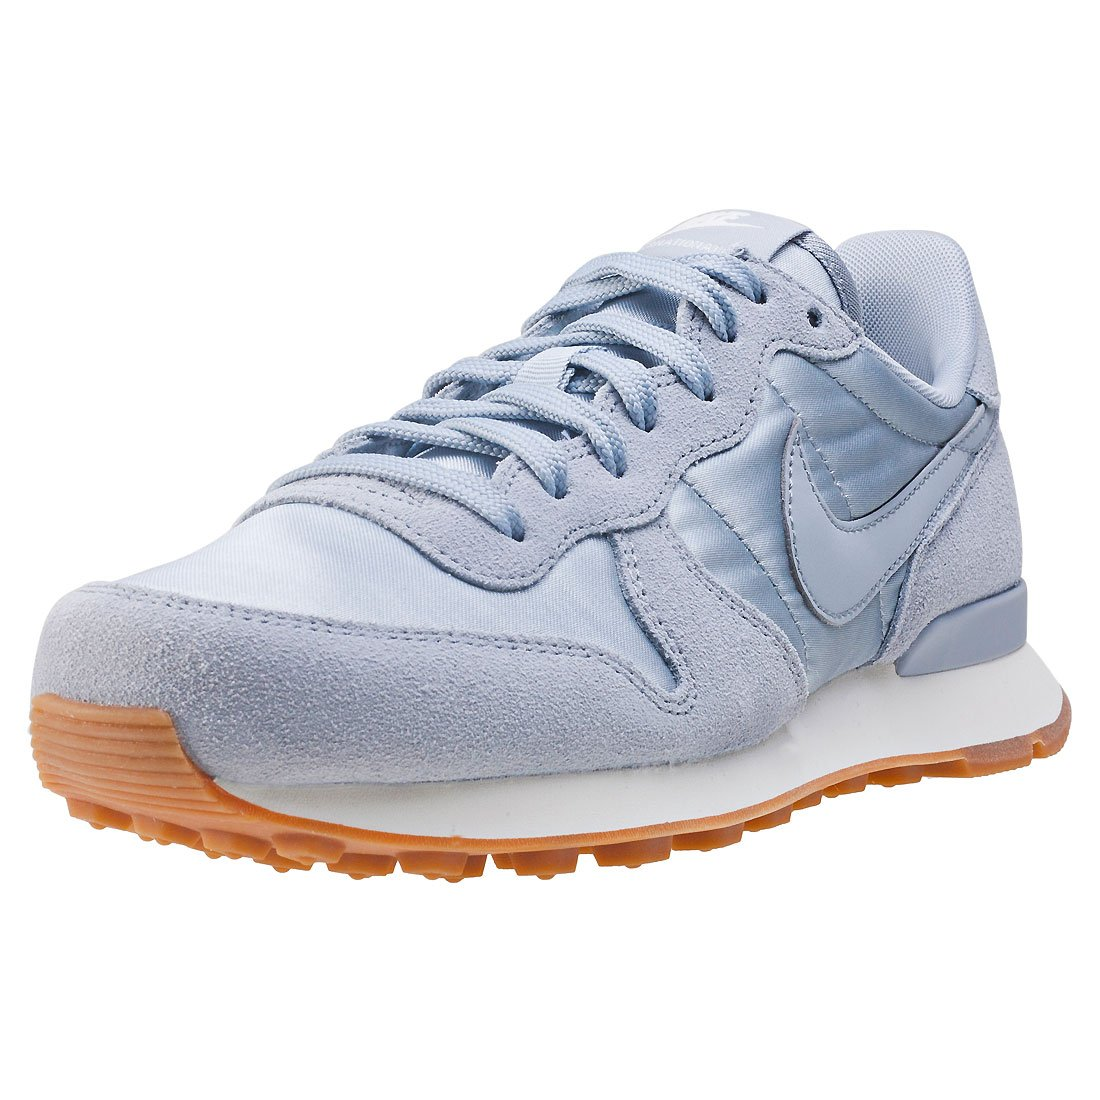 Nike Wmns Internationalist, Zapatillas de Gimnasia para Mujer 38 EU Wolf Grey/Sail